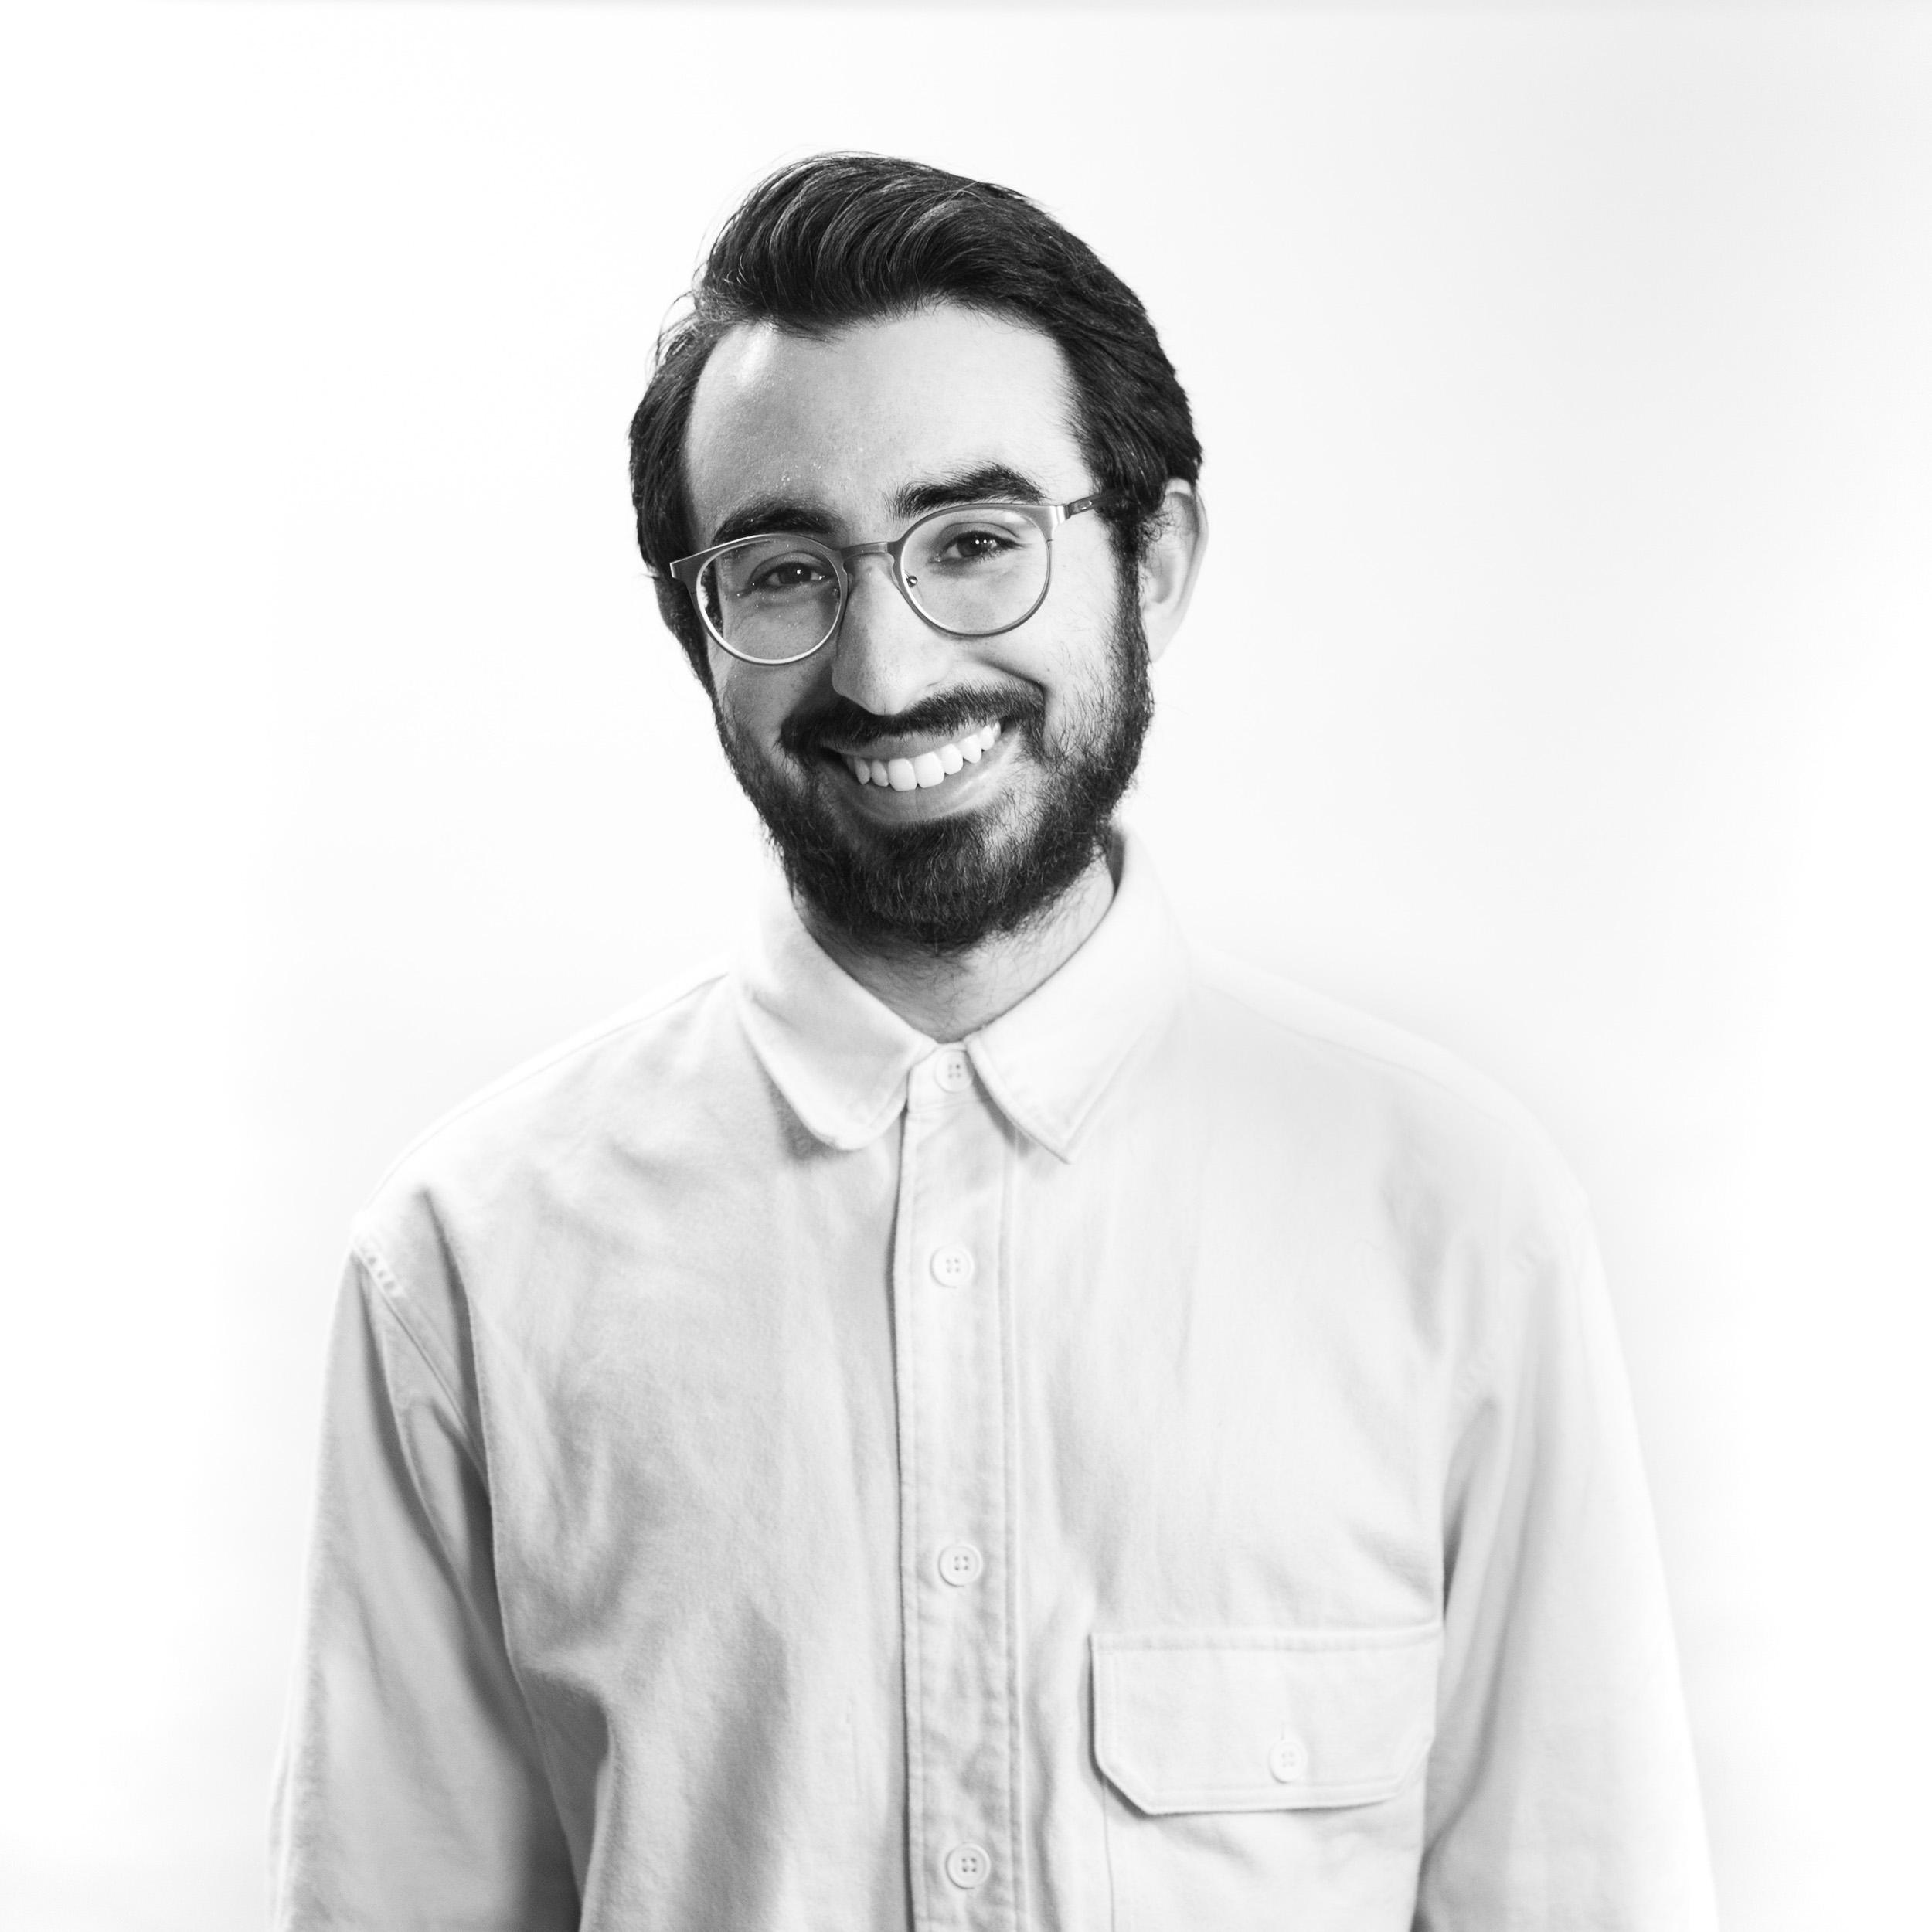 Matthew Greenberg</br>Supervising Colorist